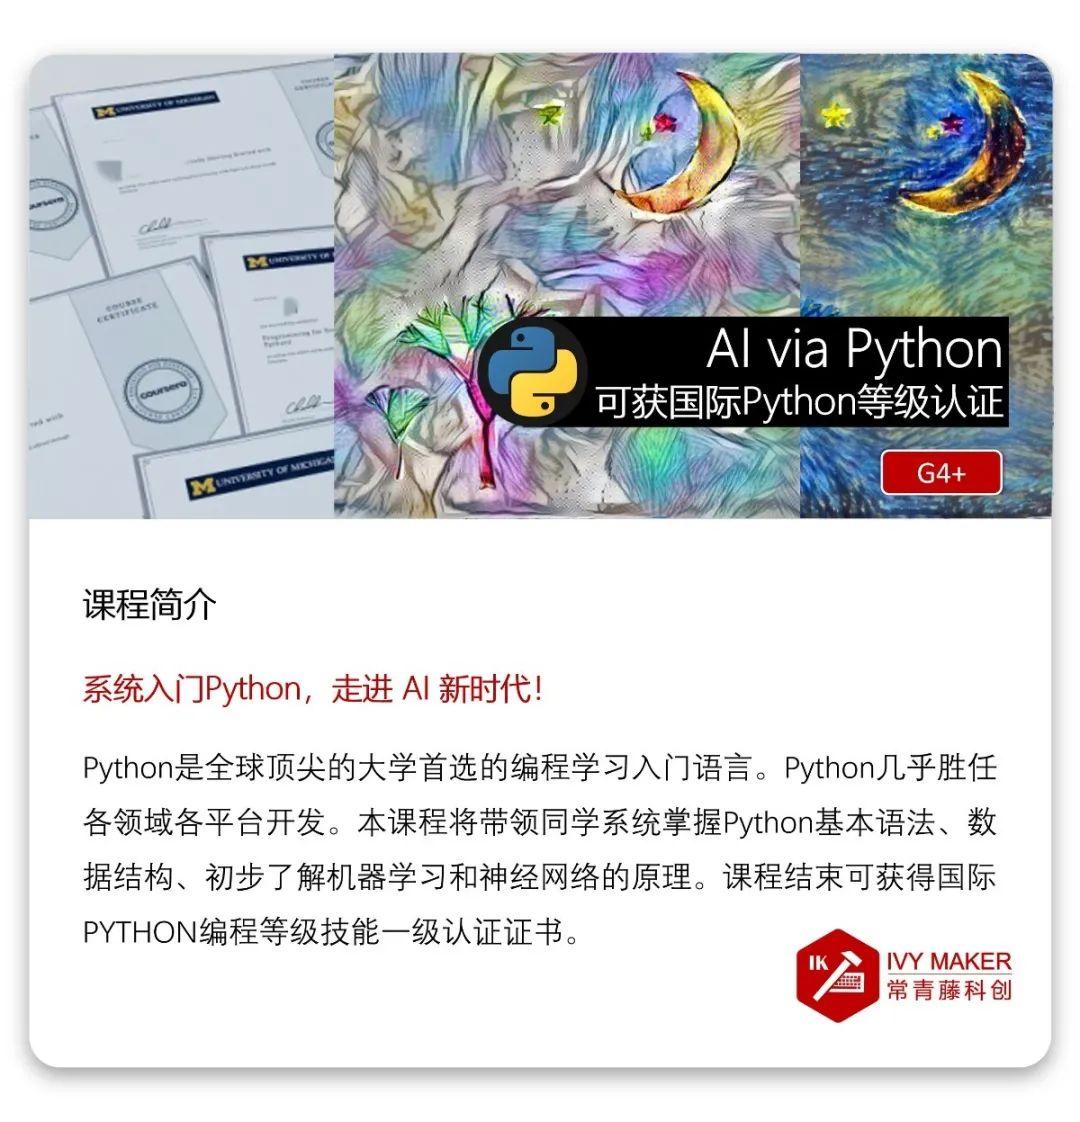 IvyMaker 2020 冬令营启动